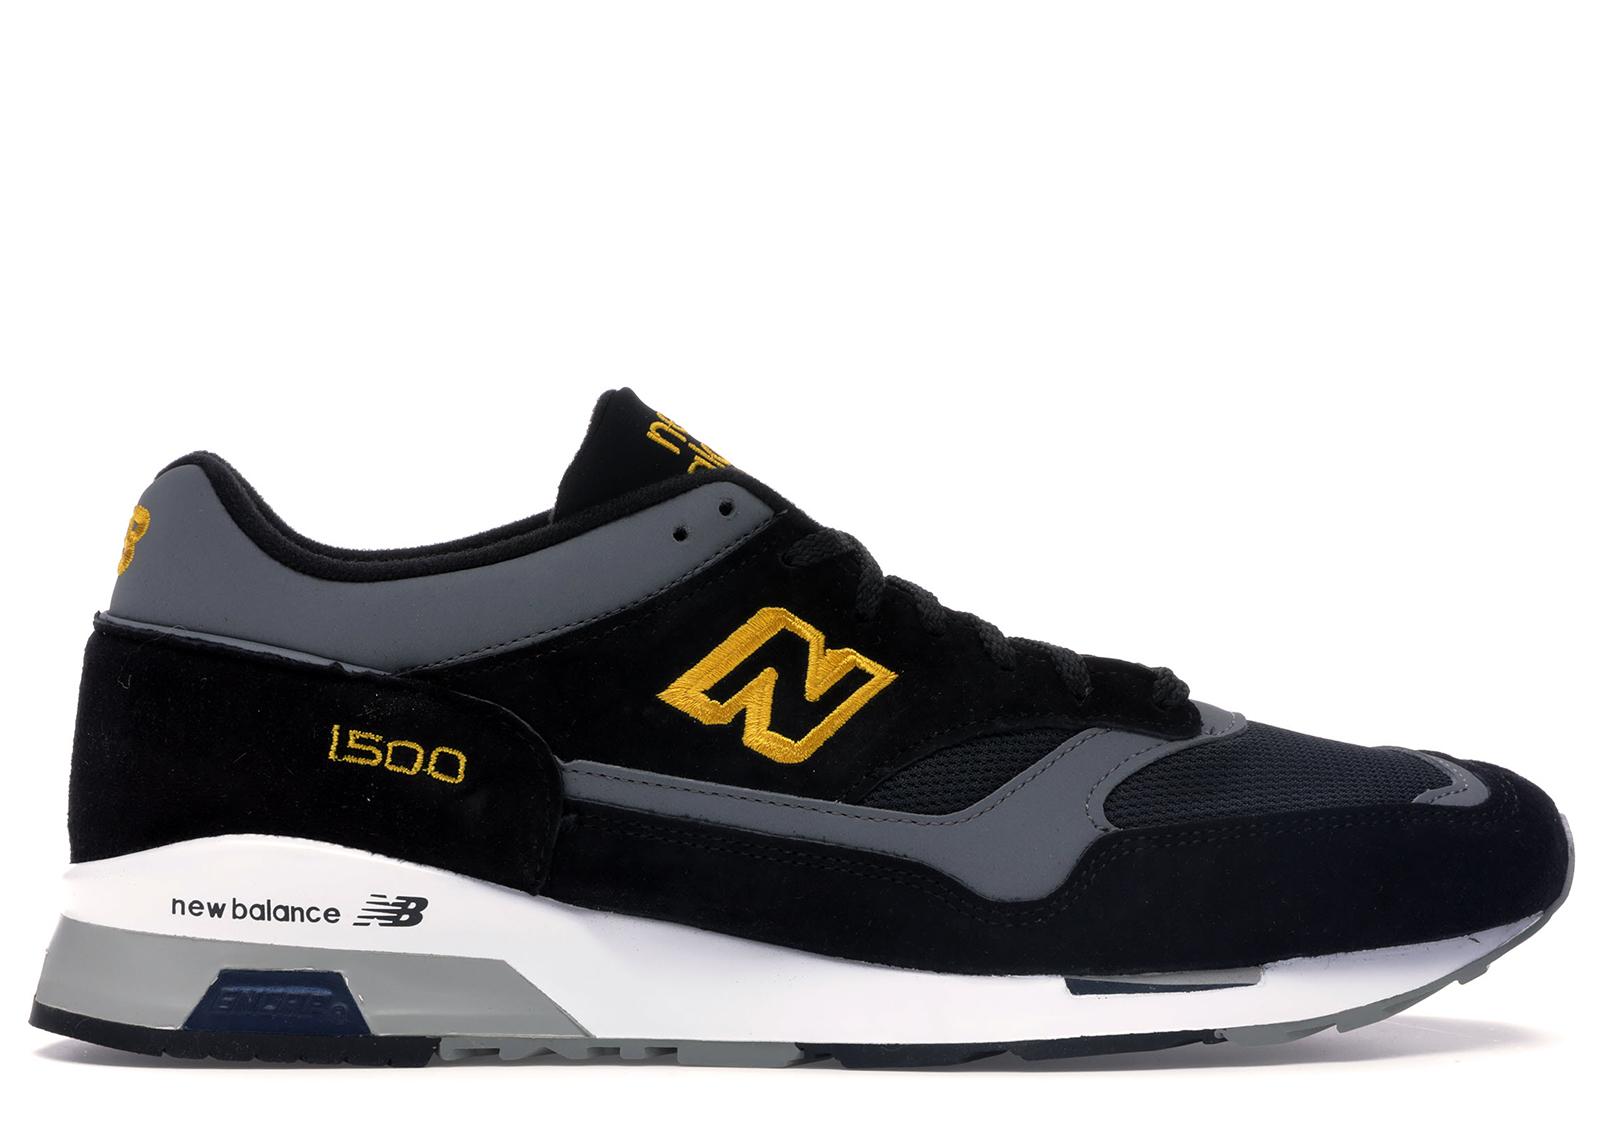 New Balance 1500 Black Yellow - M1500BY